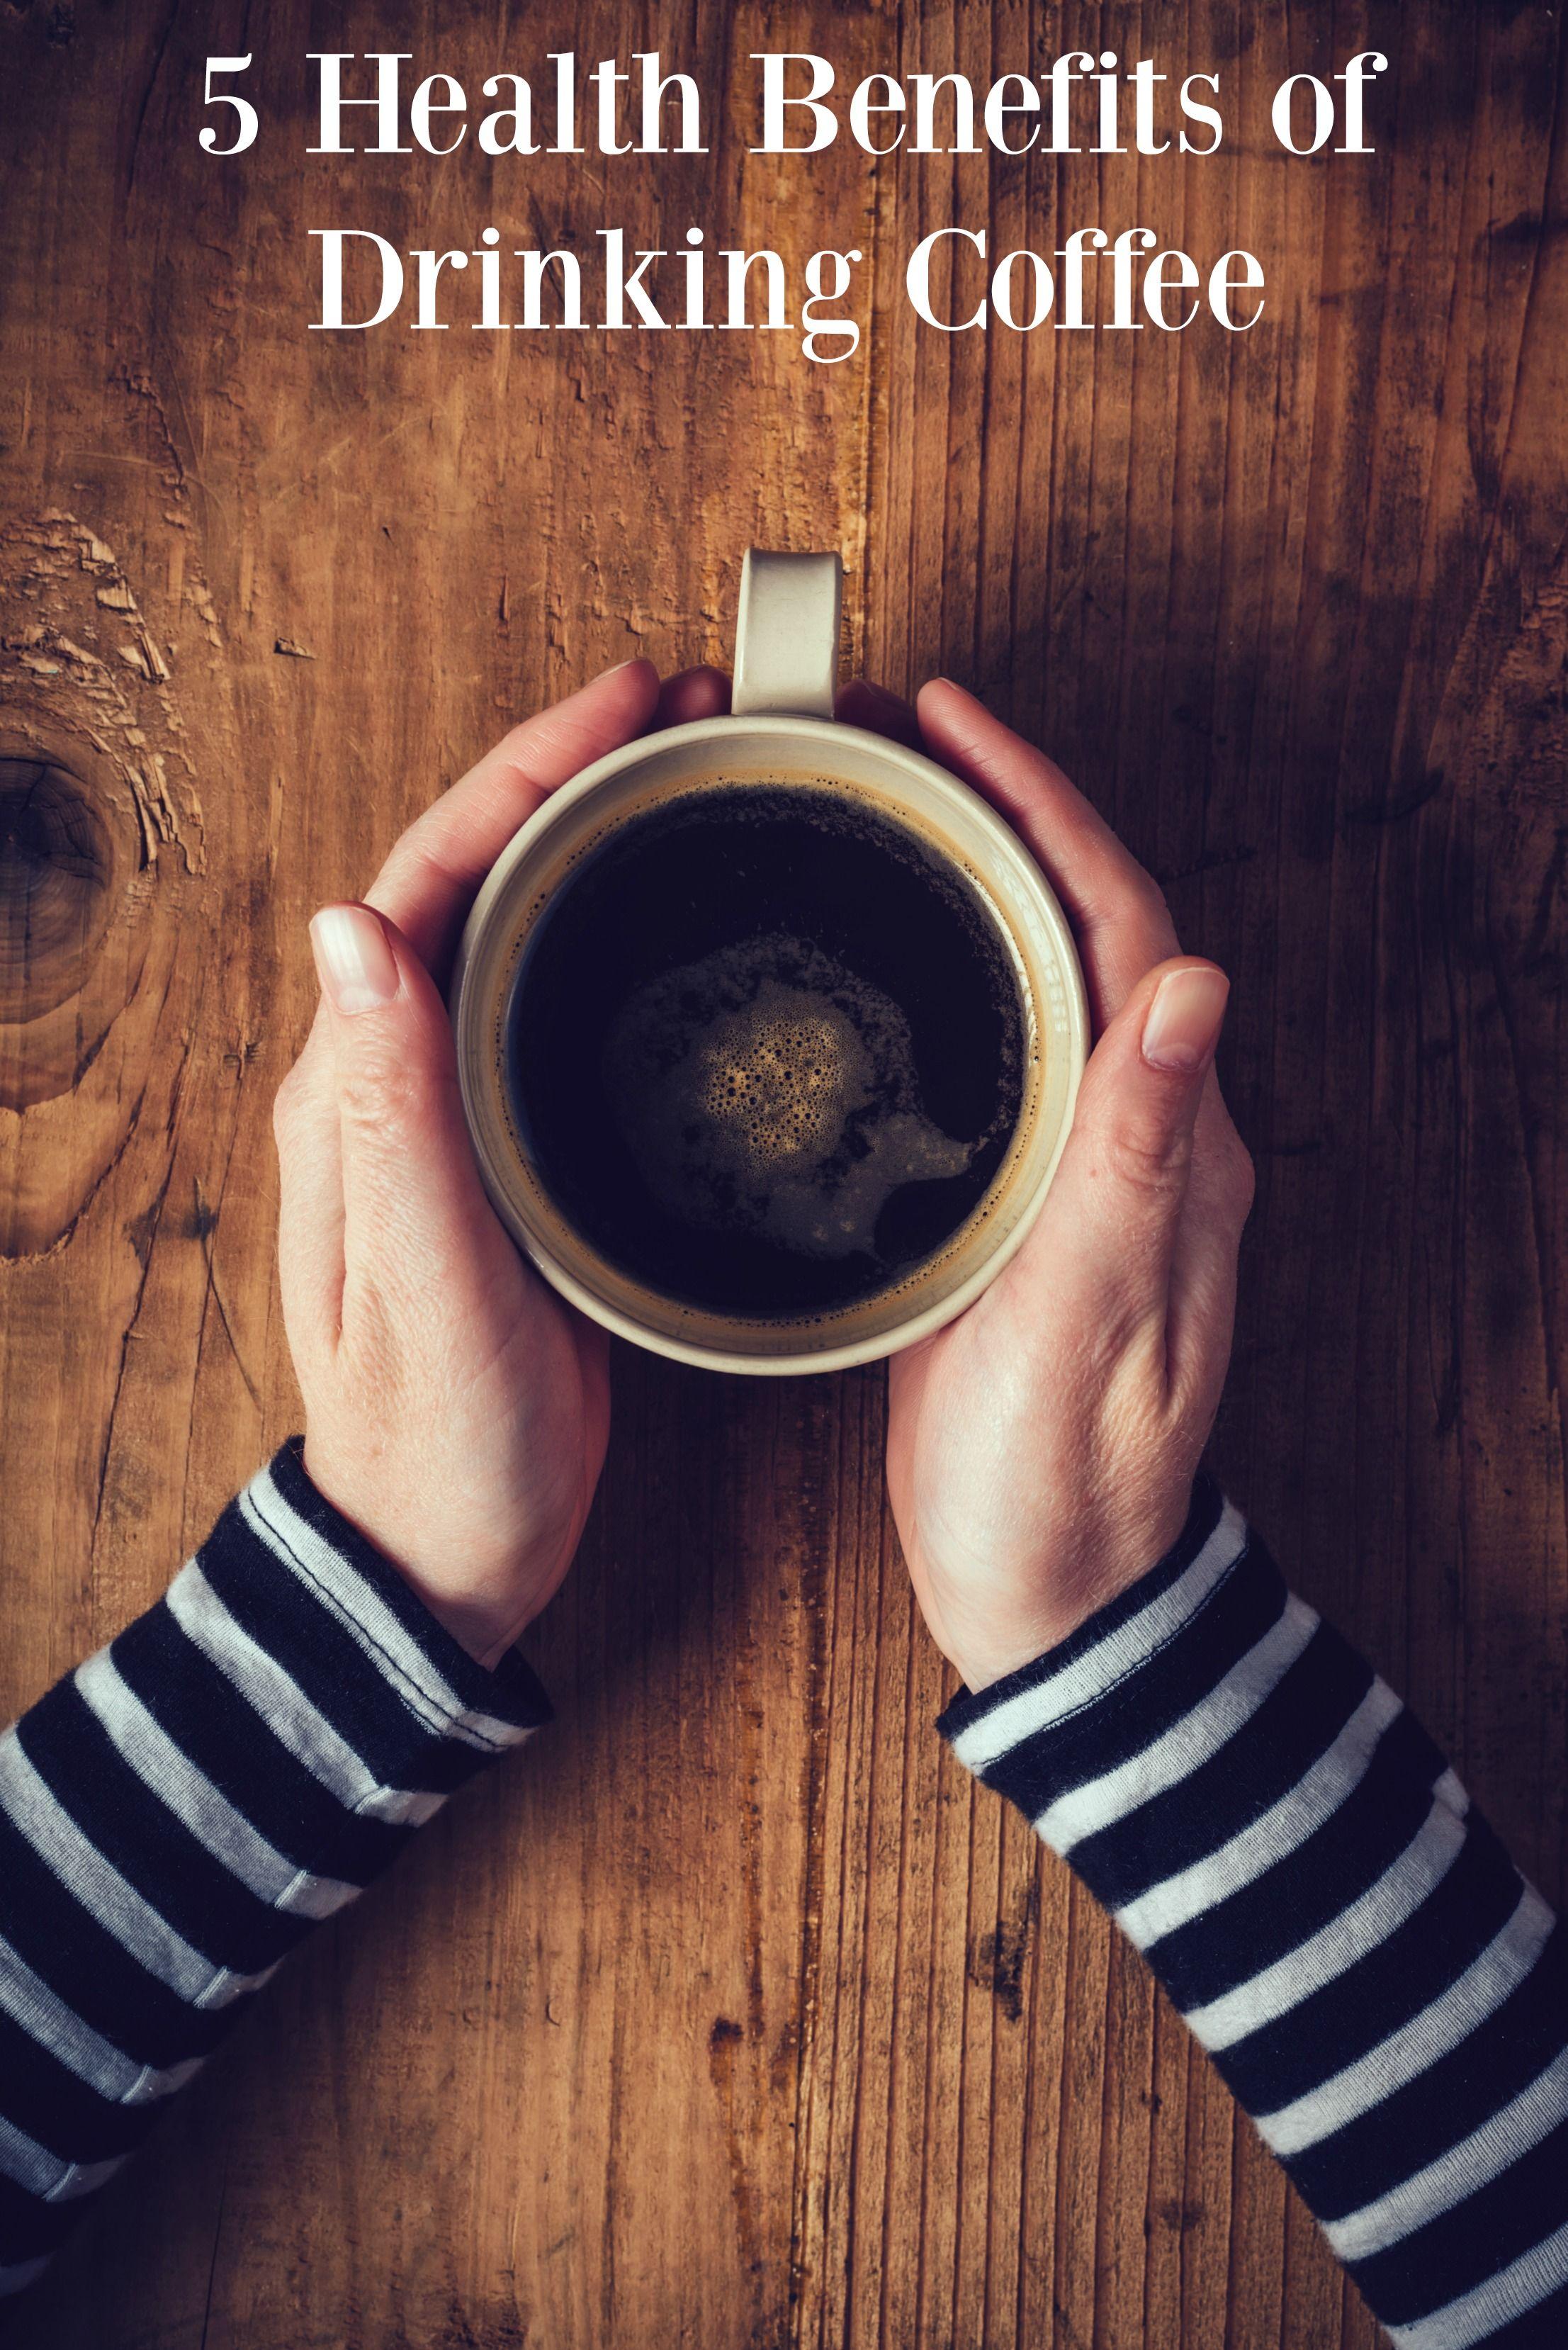 5 Health Benefits Of Drinking Coffee Sofabfood Healthy Tip Coffee Drinks Benefits Of Drinking Coffee Coffee Benefits